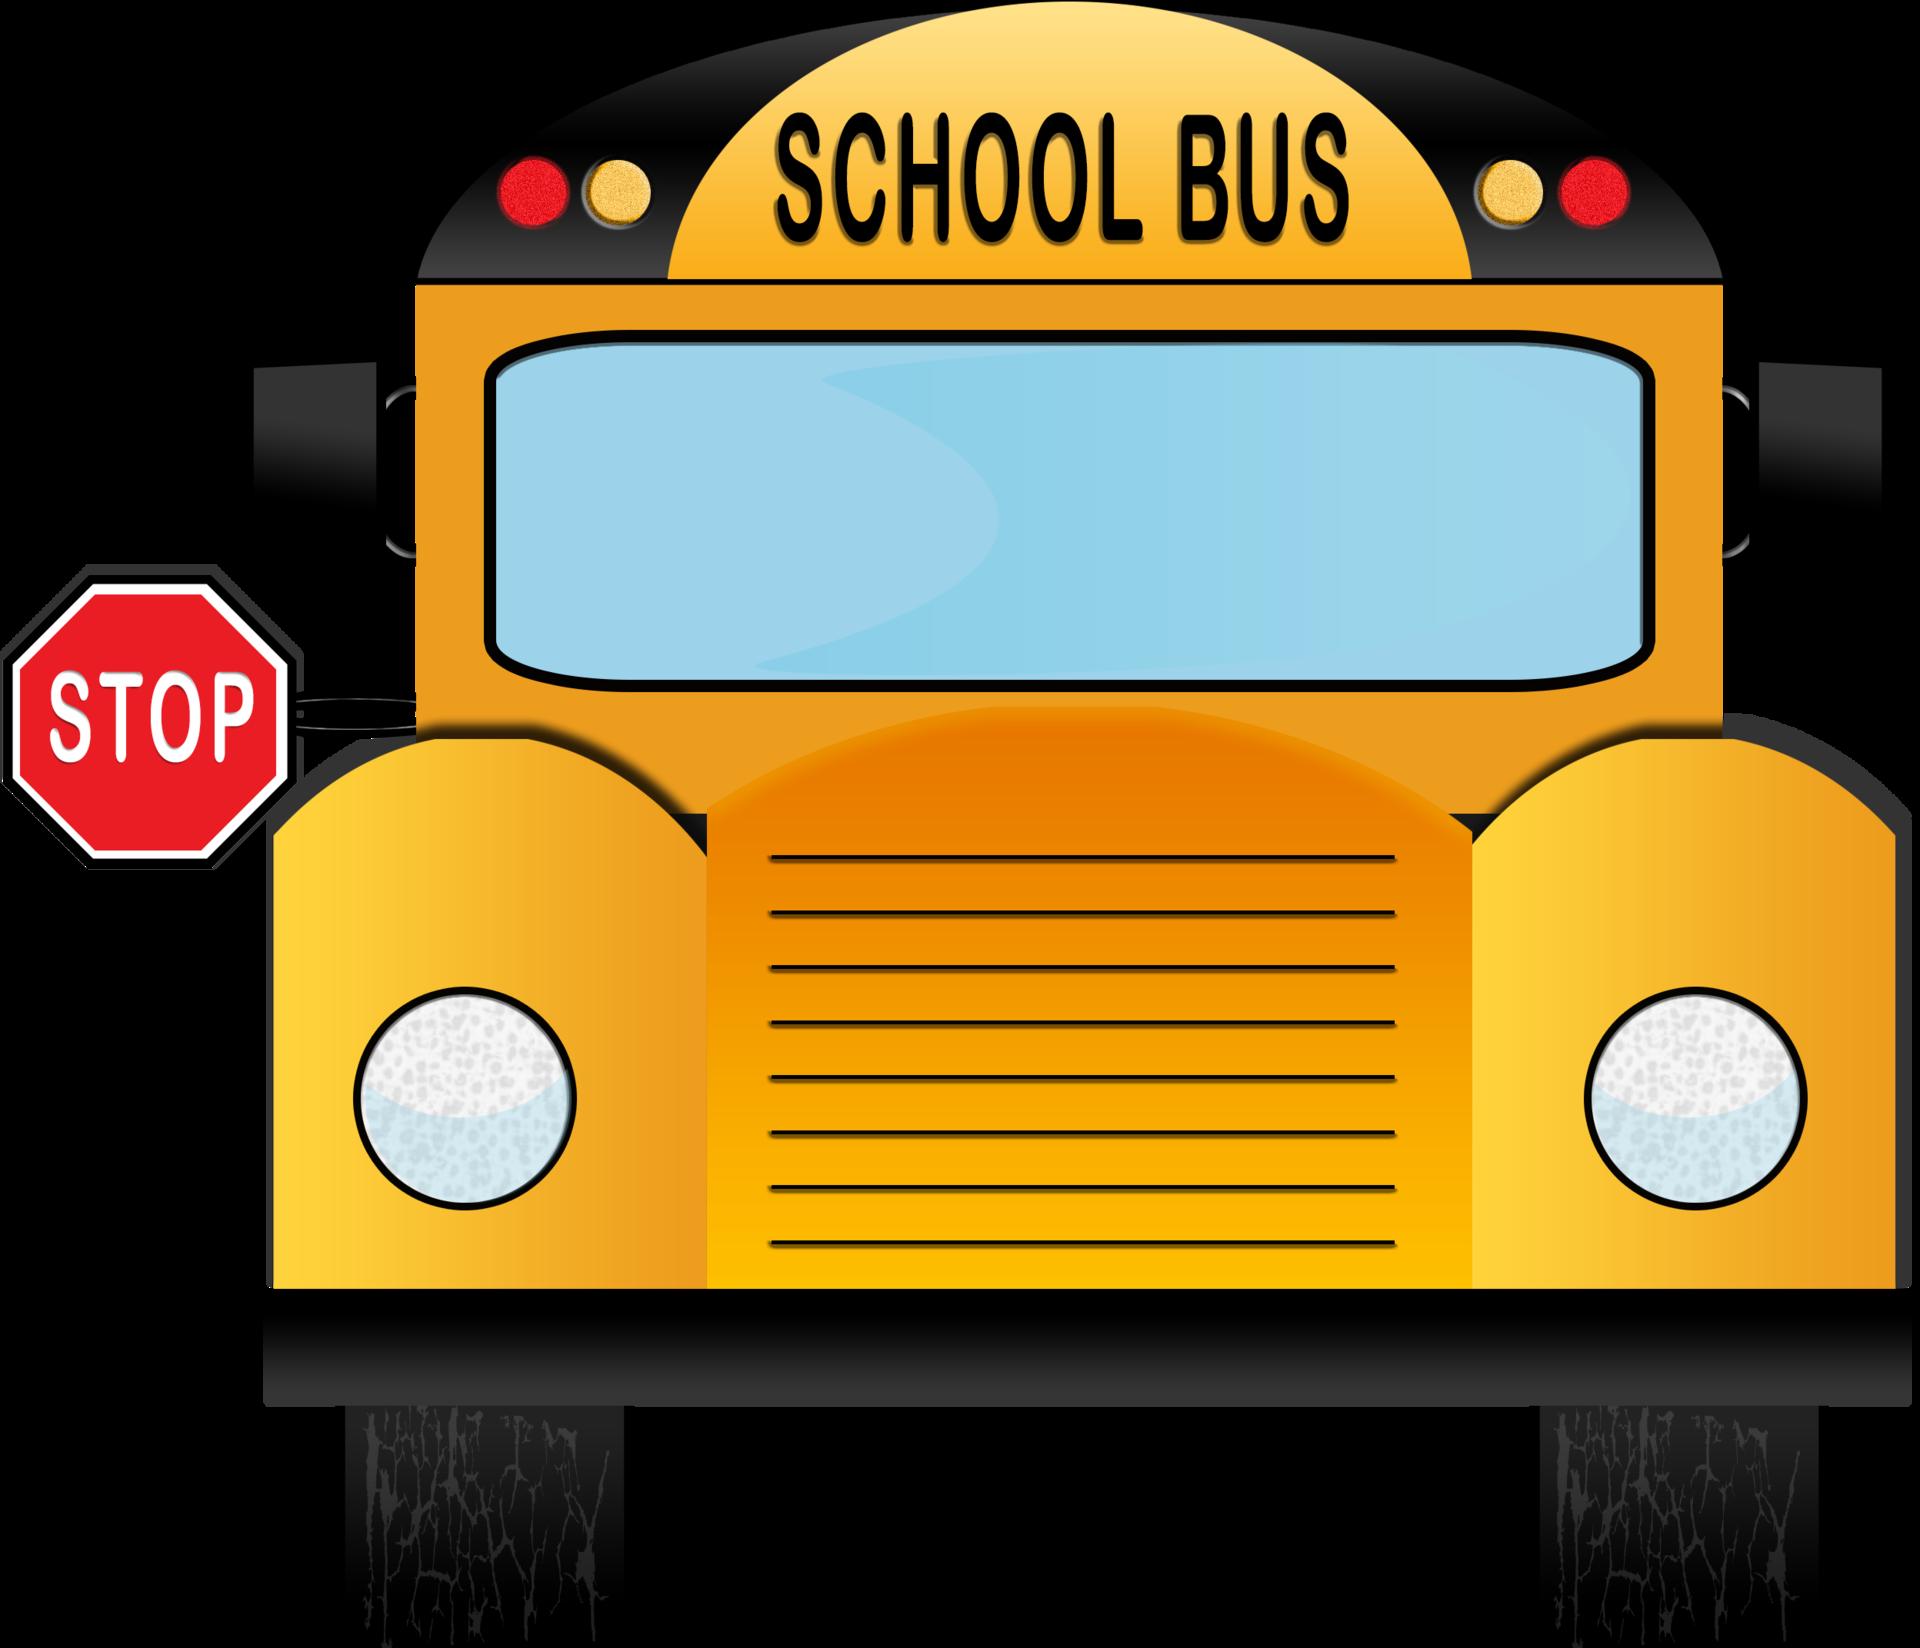 school-bus-1563493